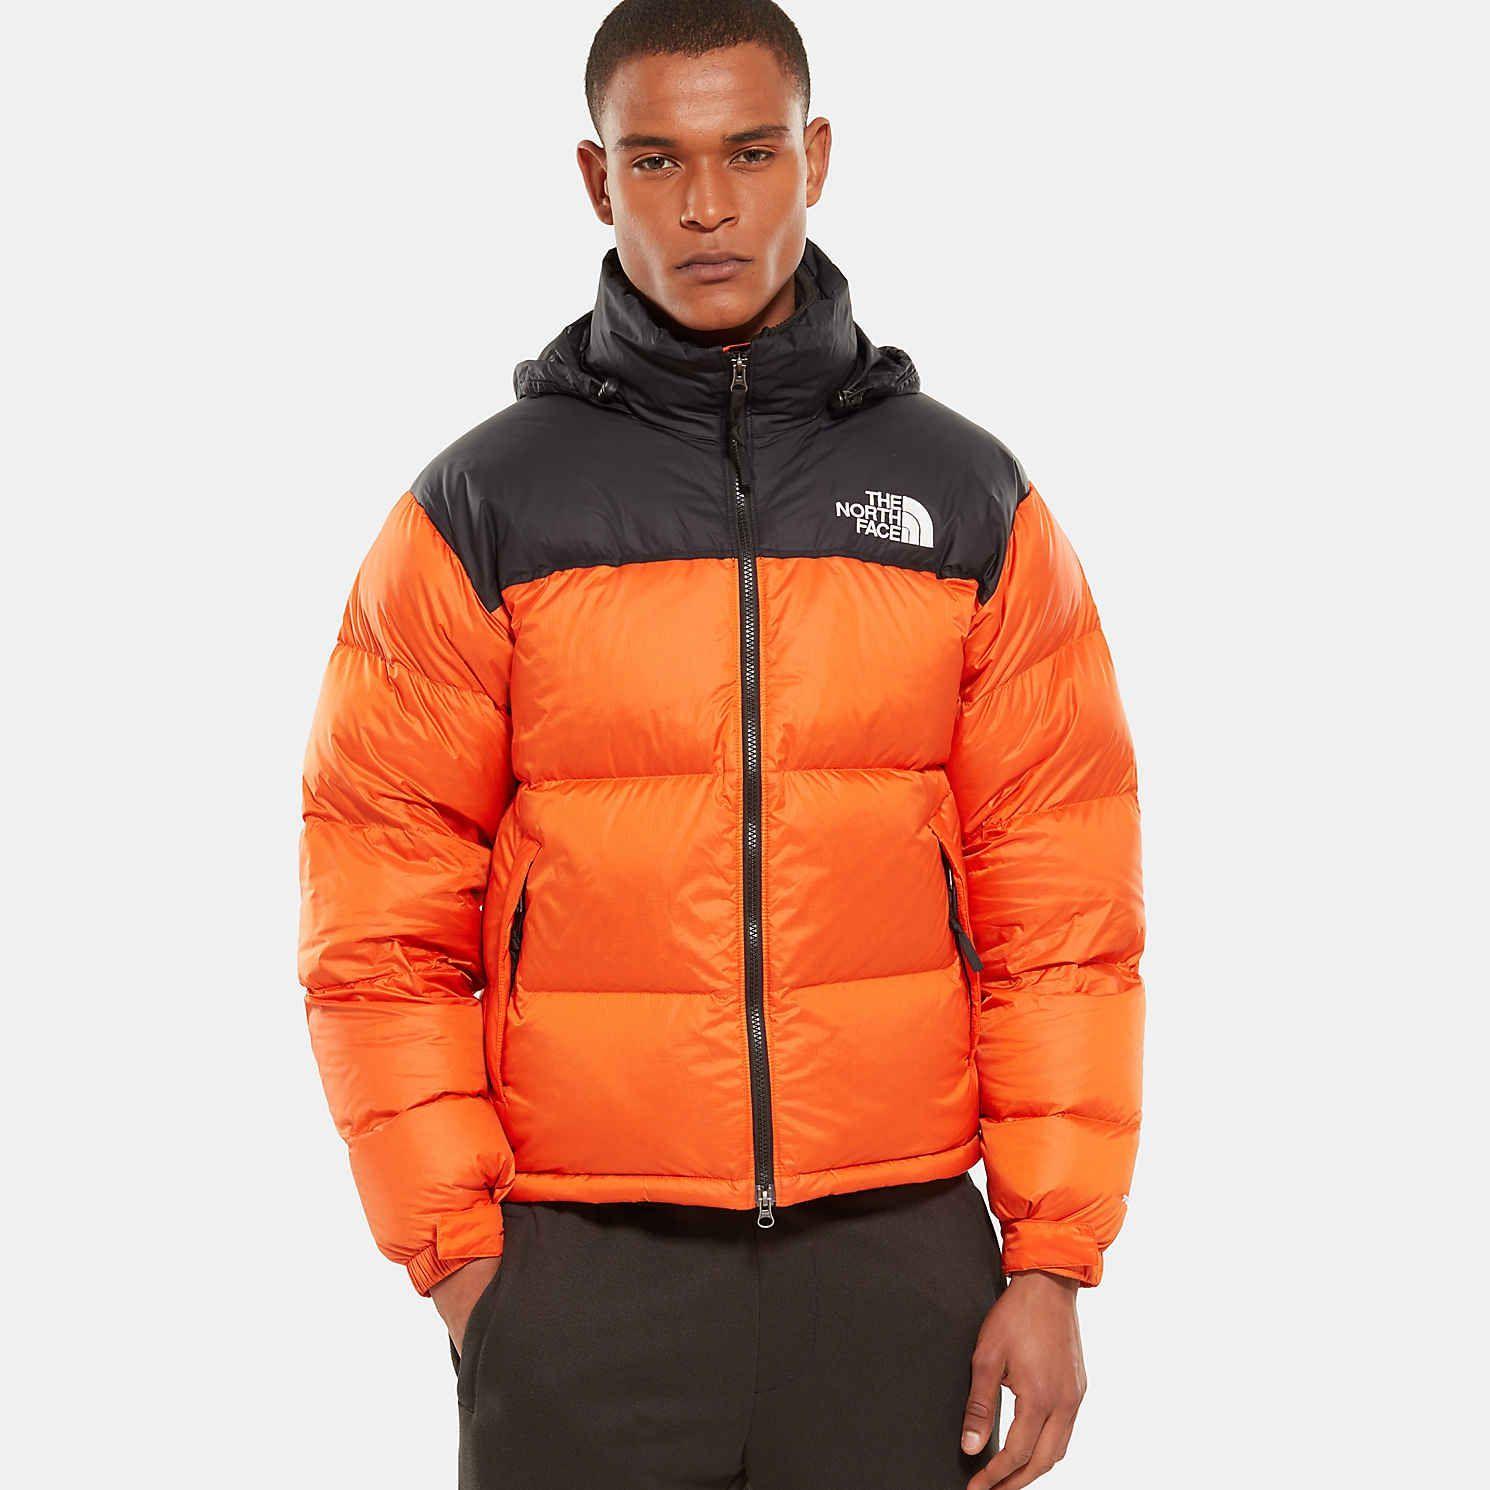 Men S 1996 Retro Nuptse Packable Jacket The North Face North Face Nuptse Jacket The North Face Packable Jacket